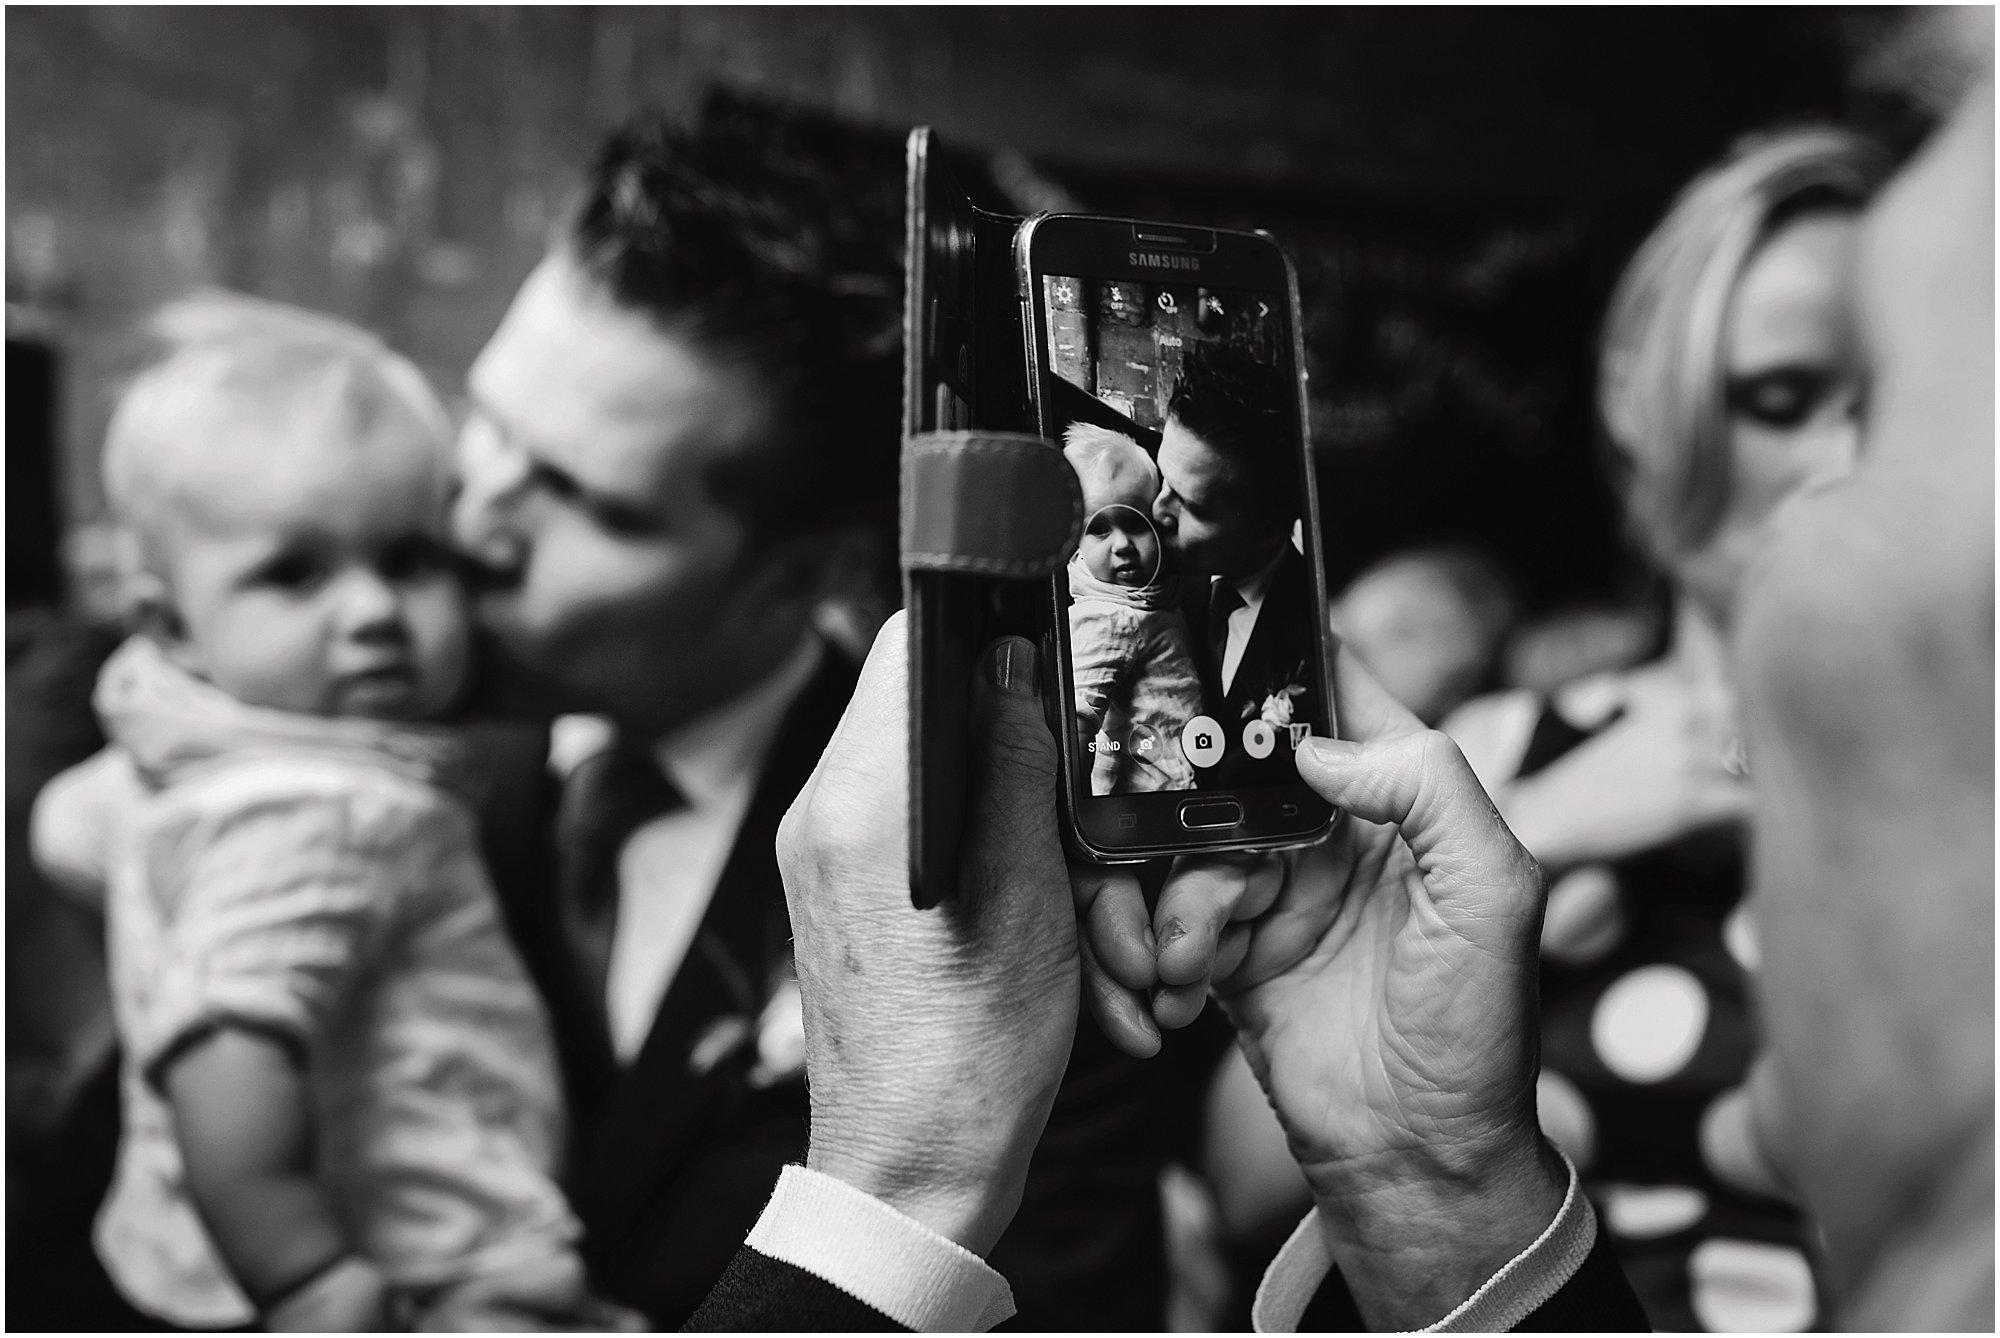 Bruidsfotograaf Maastricht, bruidsreportage Maastricht, trouwen Sibberhuuske, bruidsreportage Sibberhuuske, trouwreportage Sibberhuuske, bruidsreportage Zuid-Limburg, bruidsfotografie Sibberhuuske bruidsreportage Limburg, bruidsfotograaf Limburg, bruidsfotograaf Maastricht, bruidsfotograaf Zuid-Limburg, trouwfoto Maastricht, trouwfoto Neercanne, trouwen Sibberhuuske, trouwen bij Sibberhuuske, trouwen Valkenburg